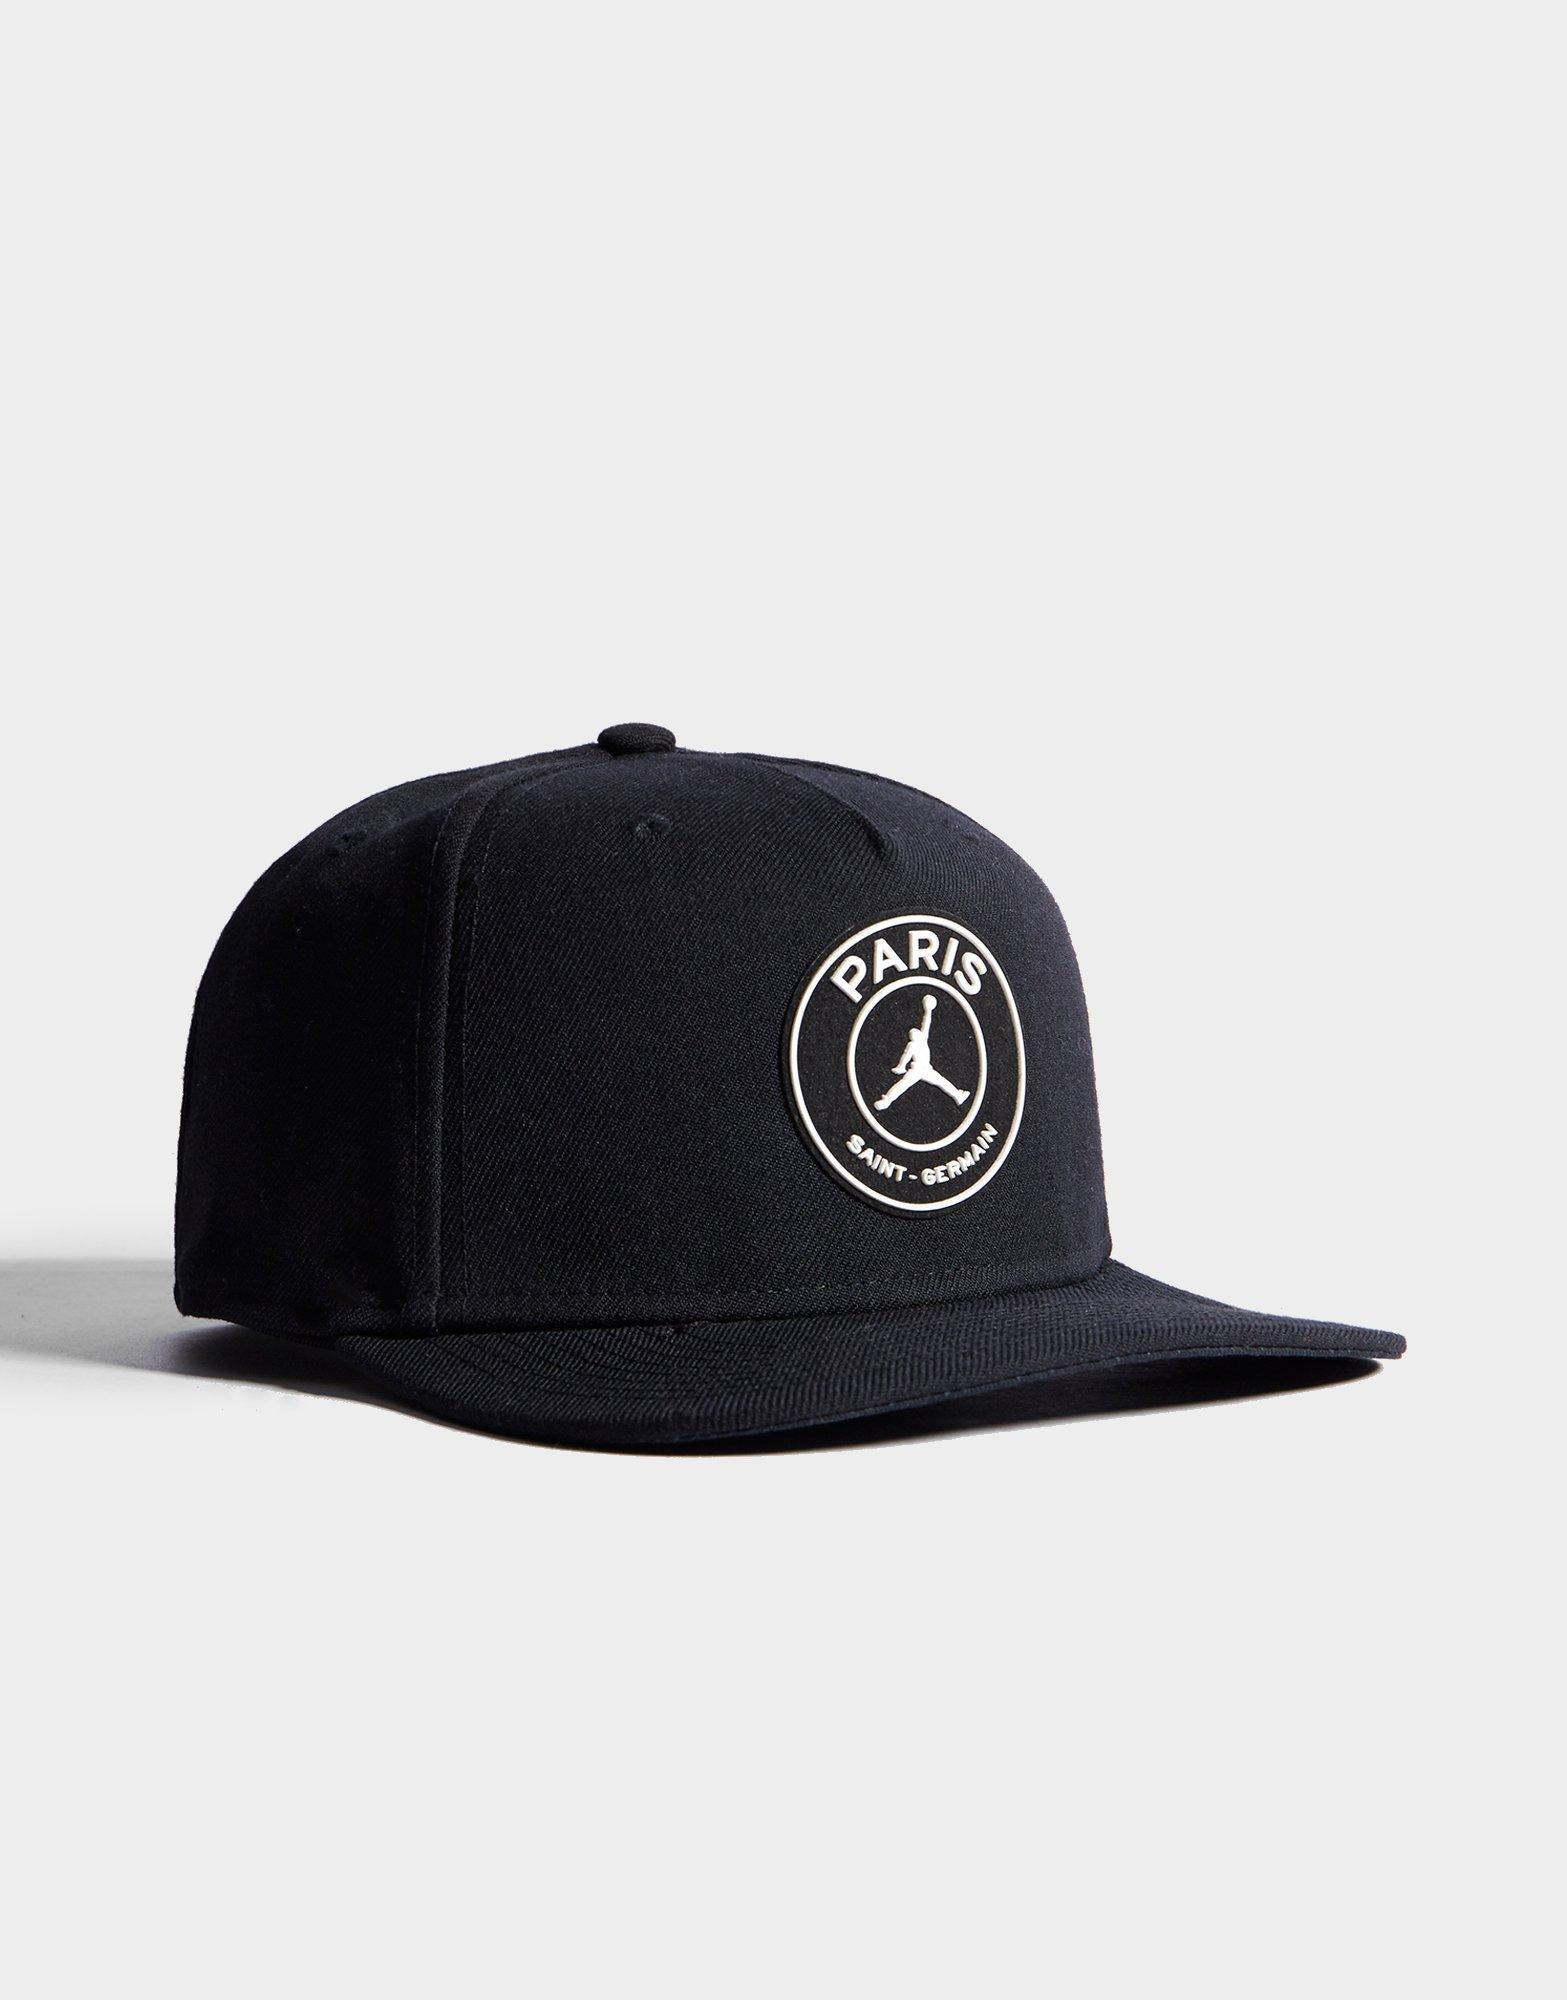 1ee98dfda43c85 Nike X Paris Saint Germain Pro Cap in Black for Men - Lyst